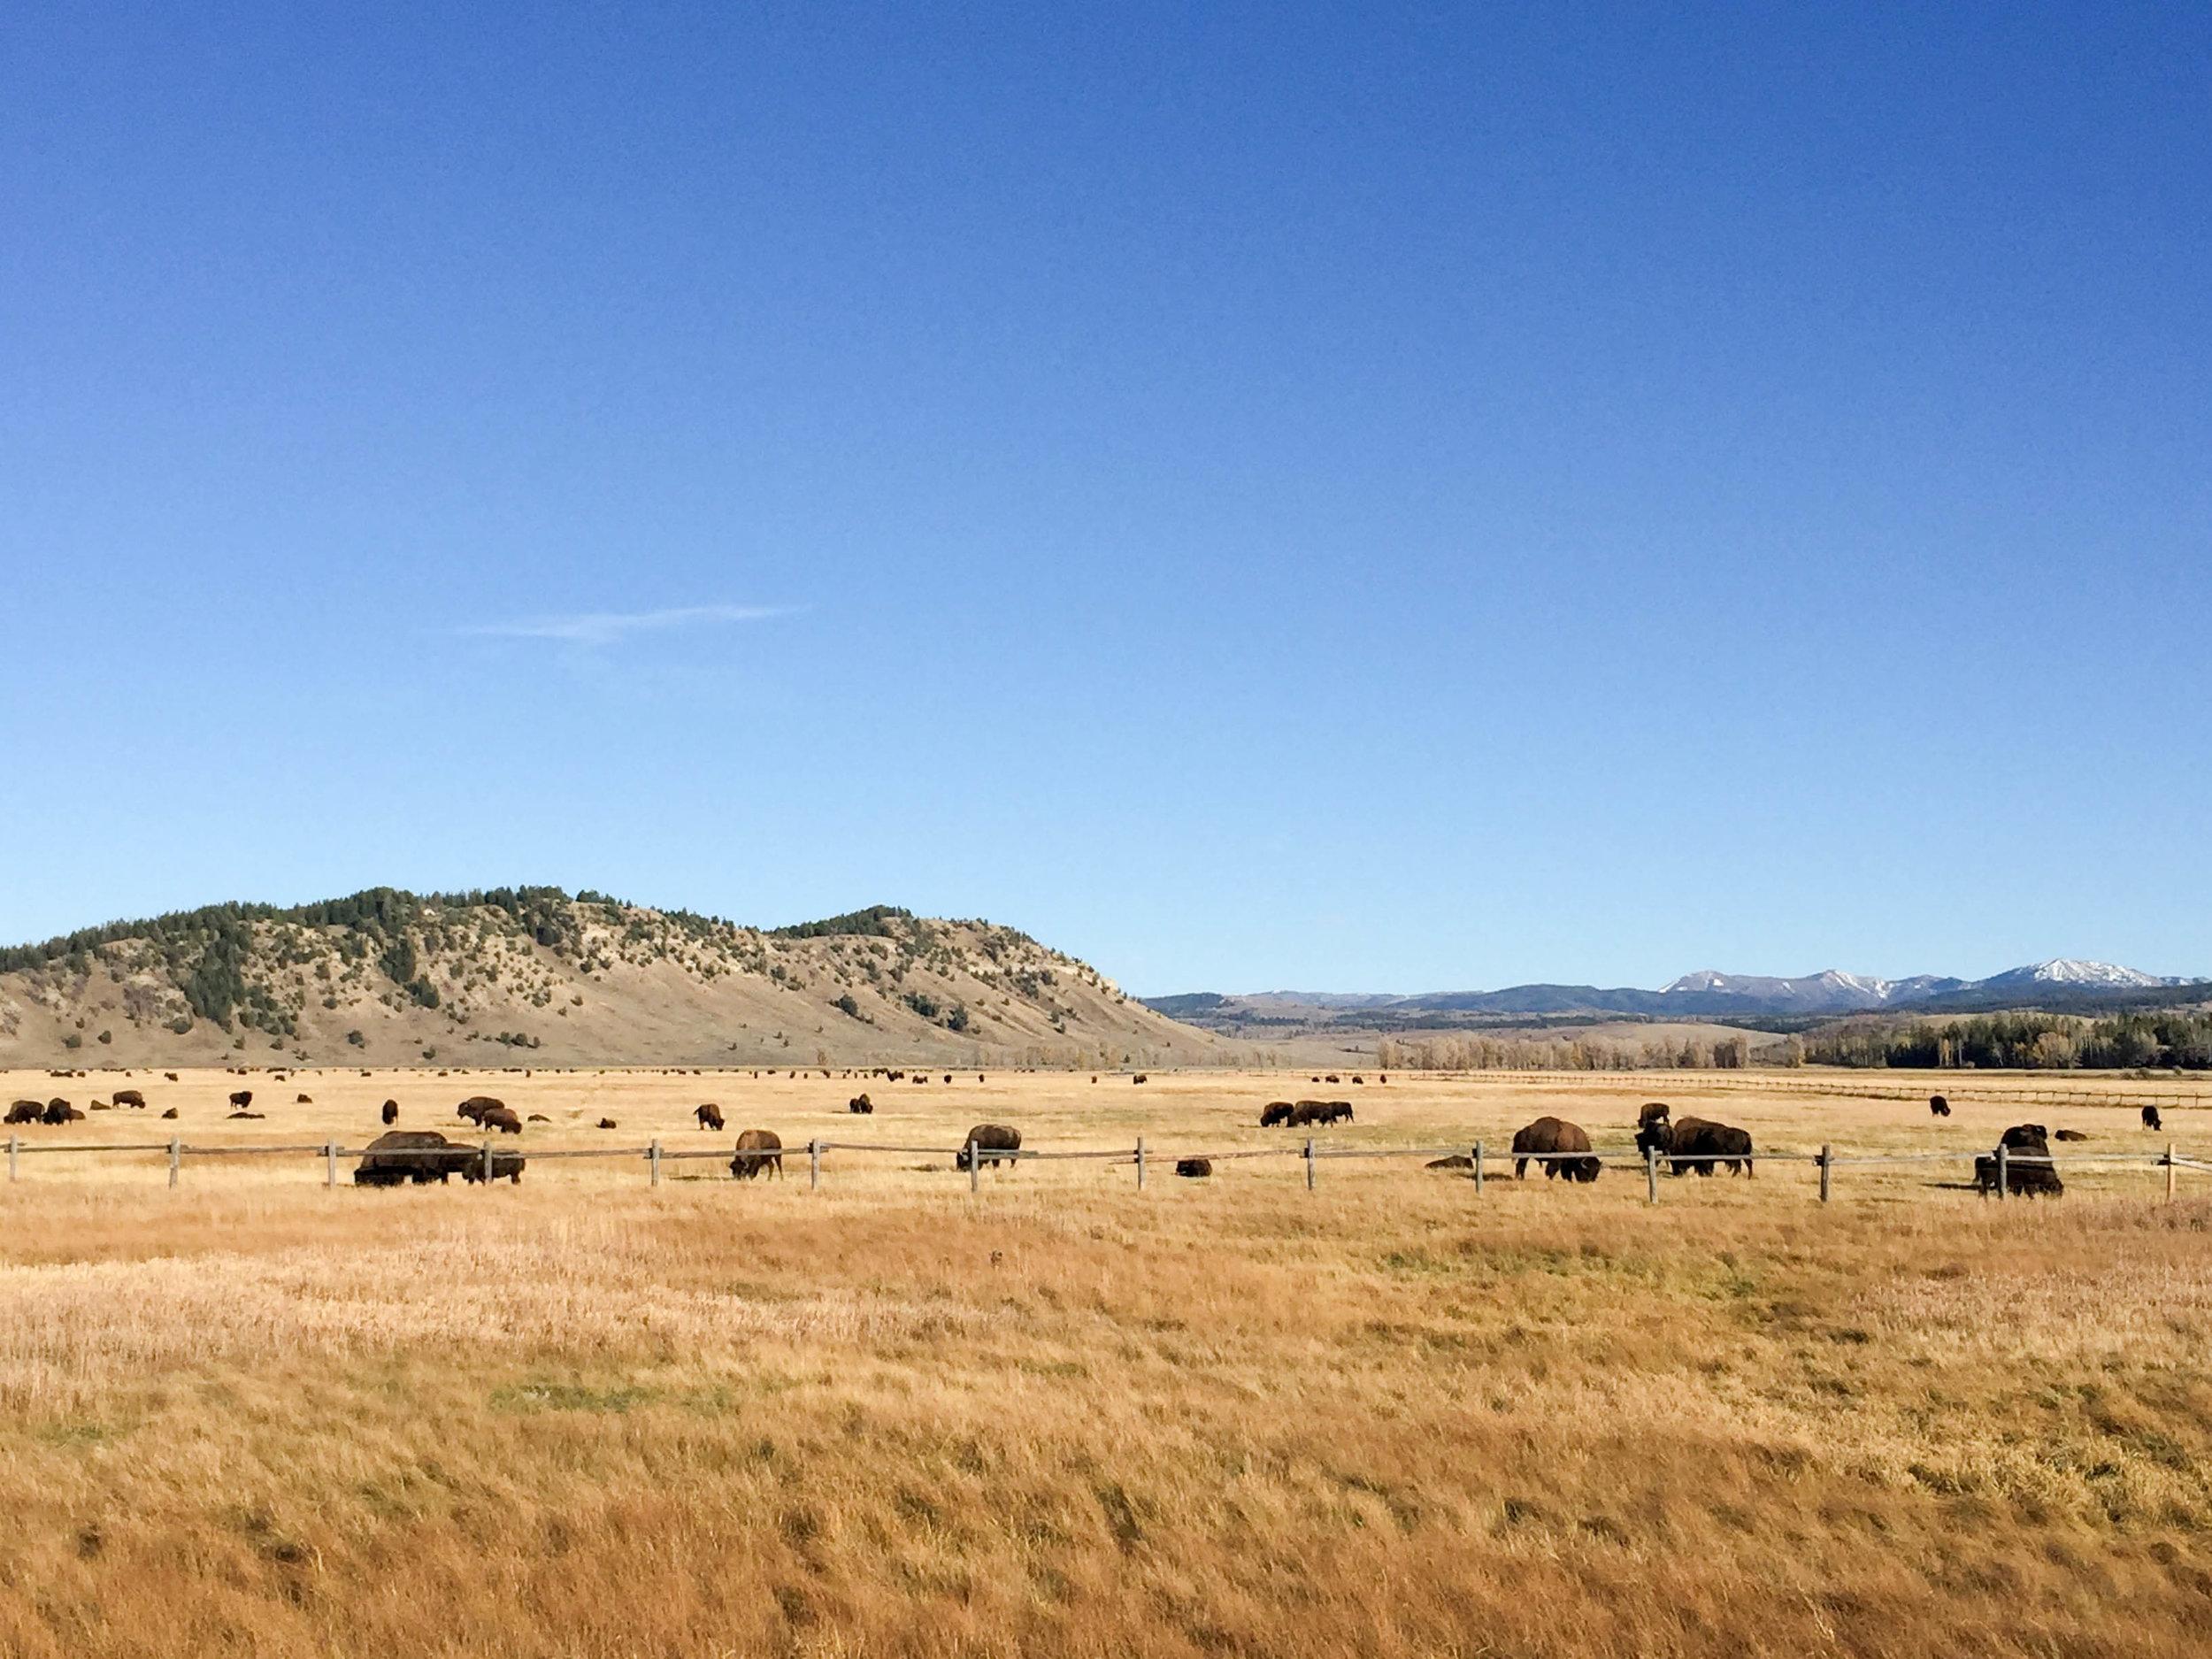 Bison roam near Yellowstone National Park in Jackson, Wyoming, October 2016.